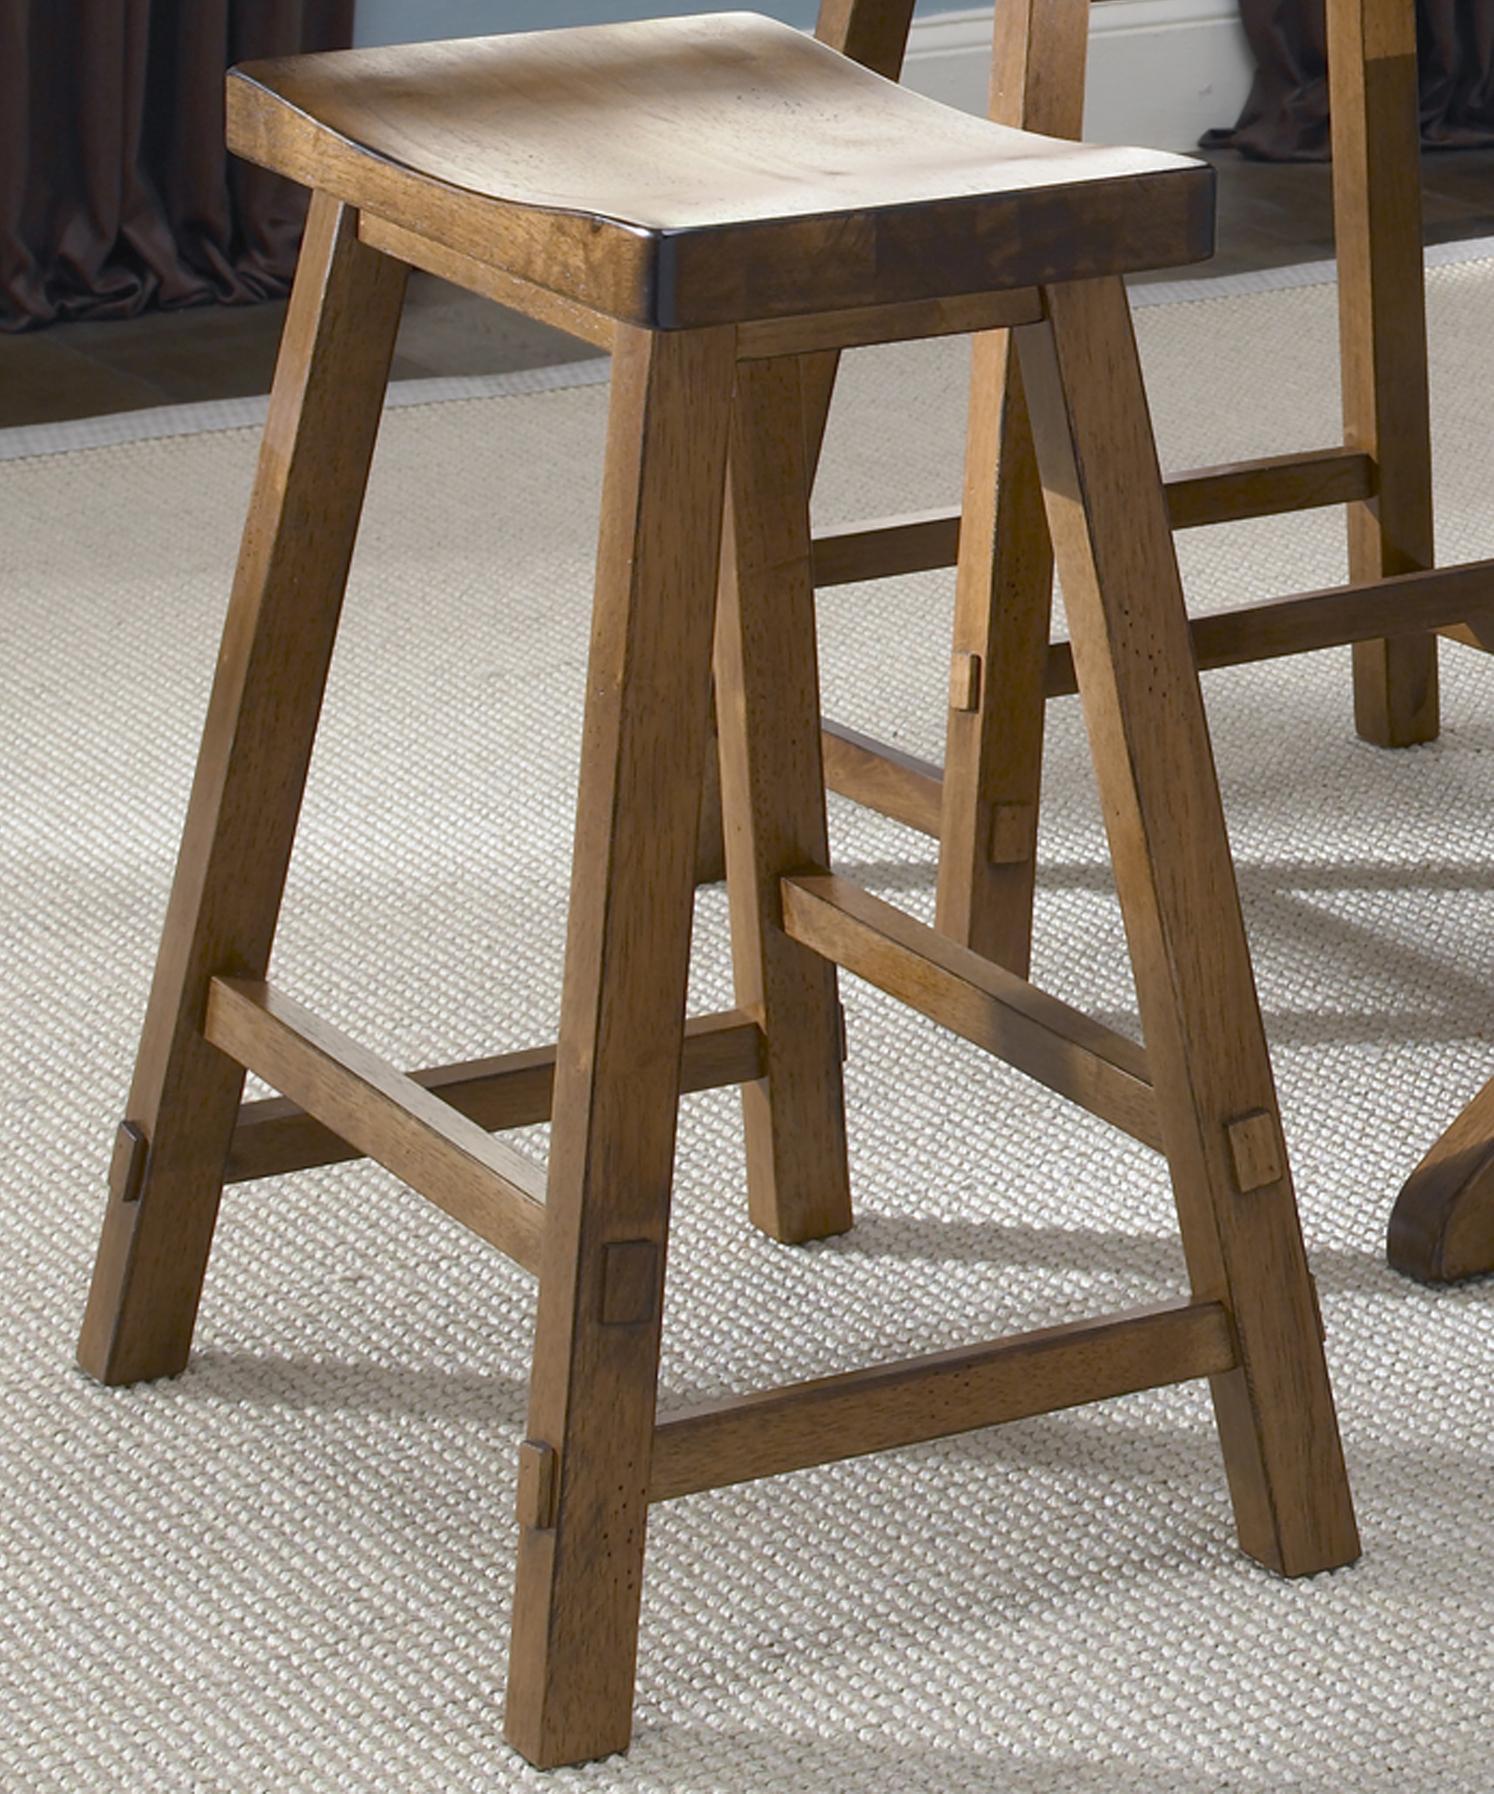 Liberty Furniture Creations II 30 Inch Sawhorse Barstool